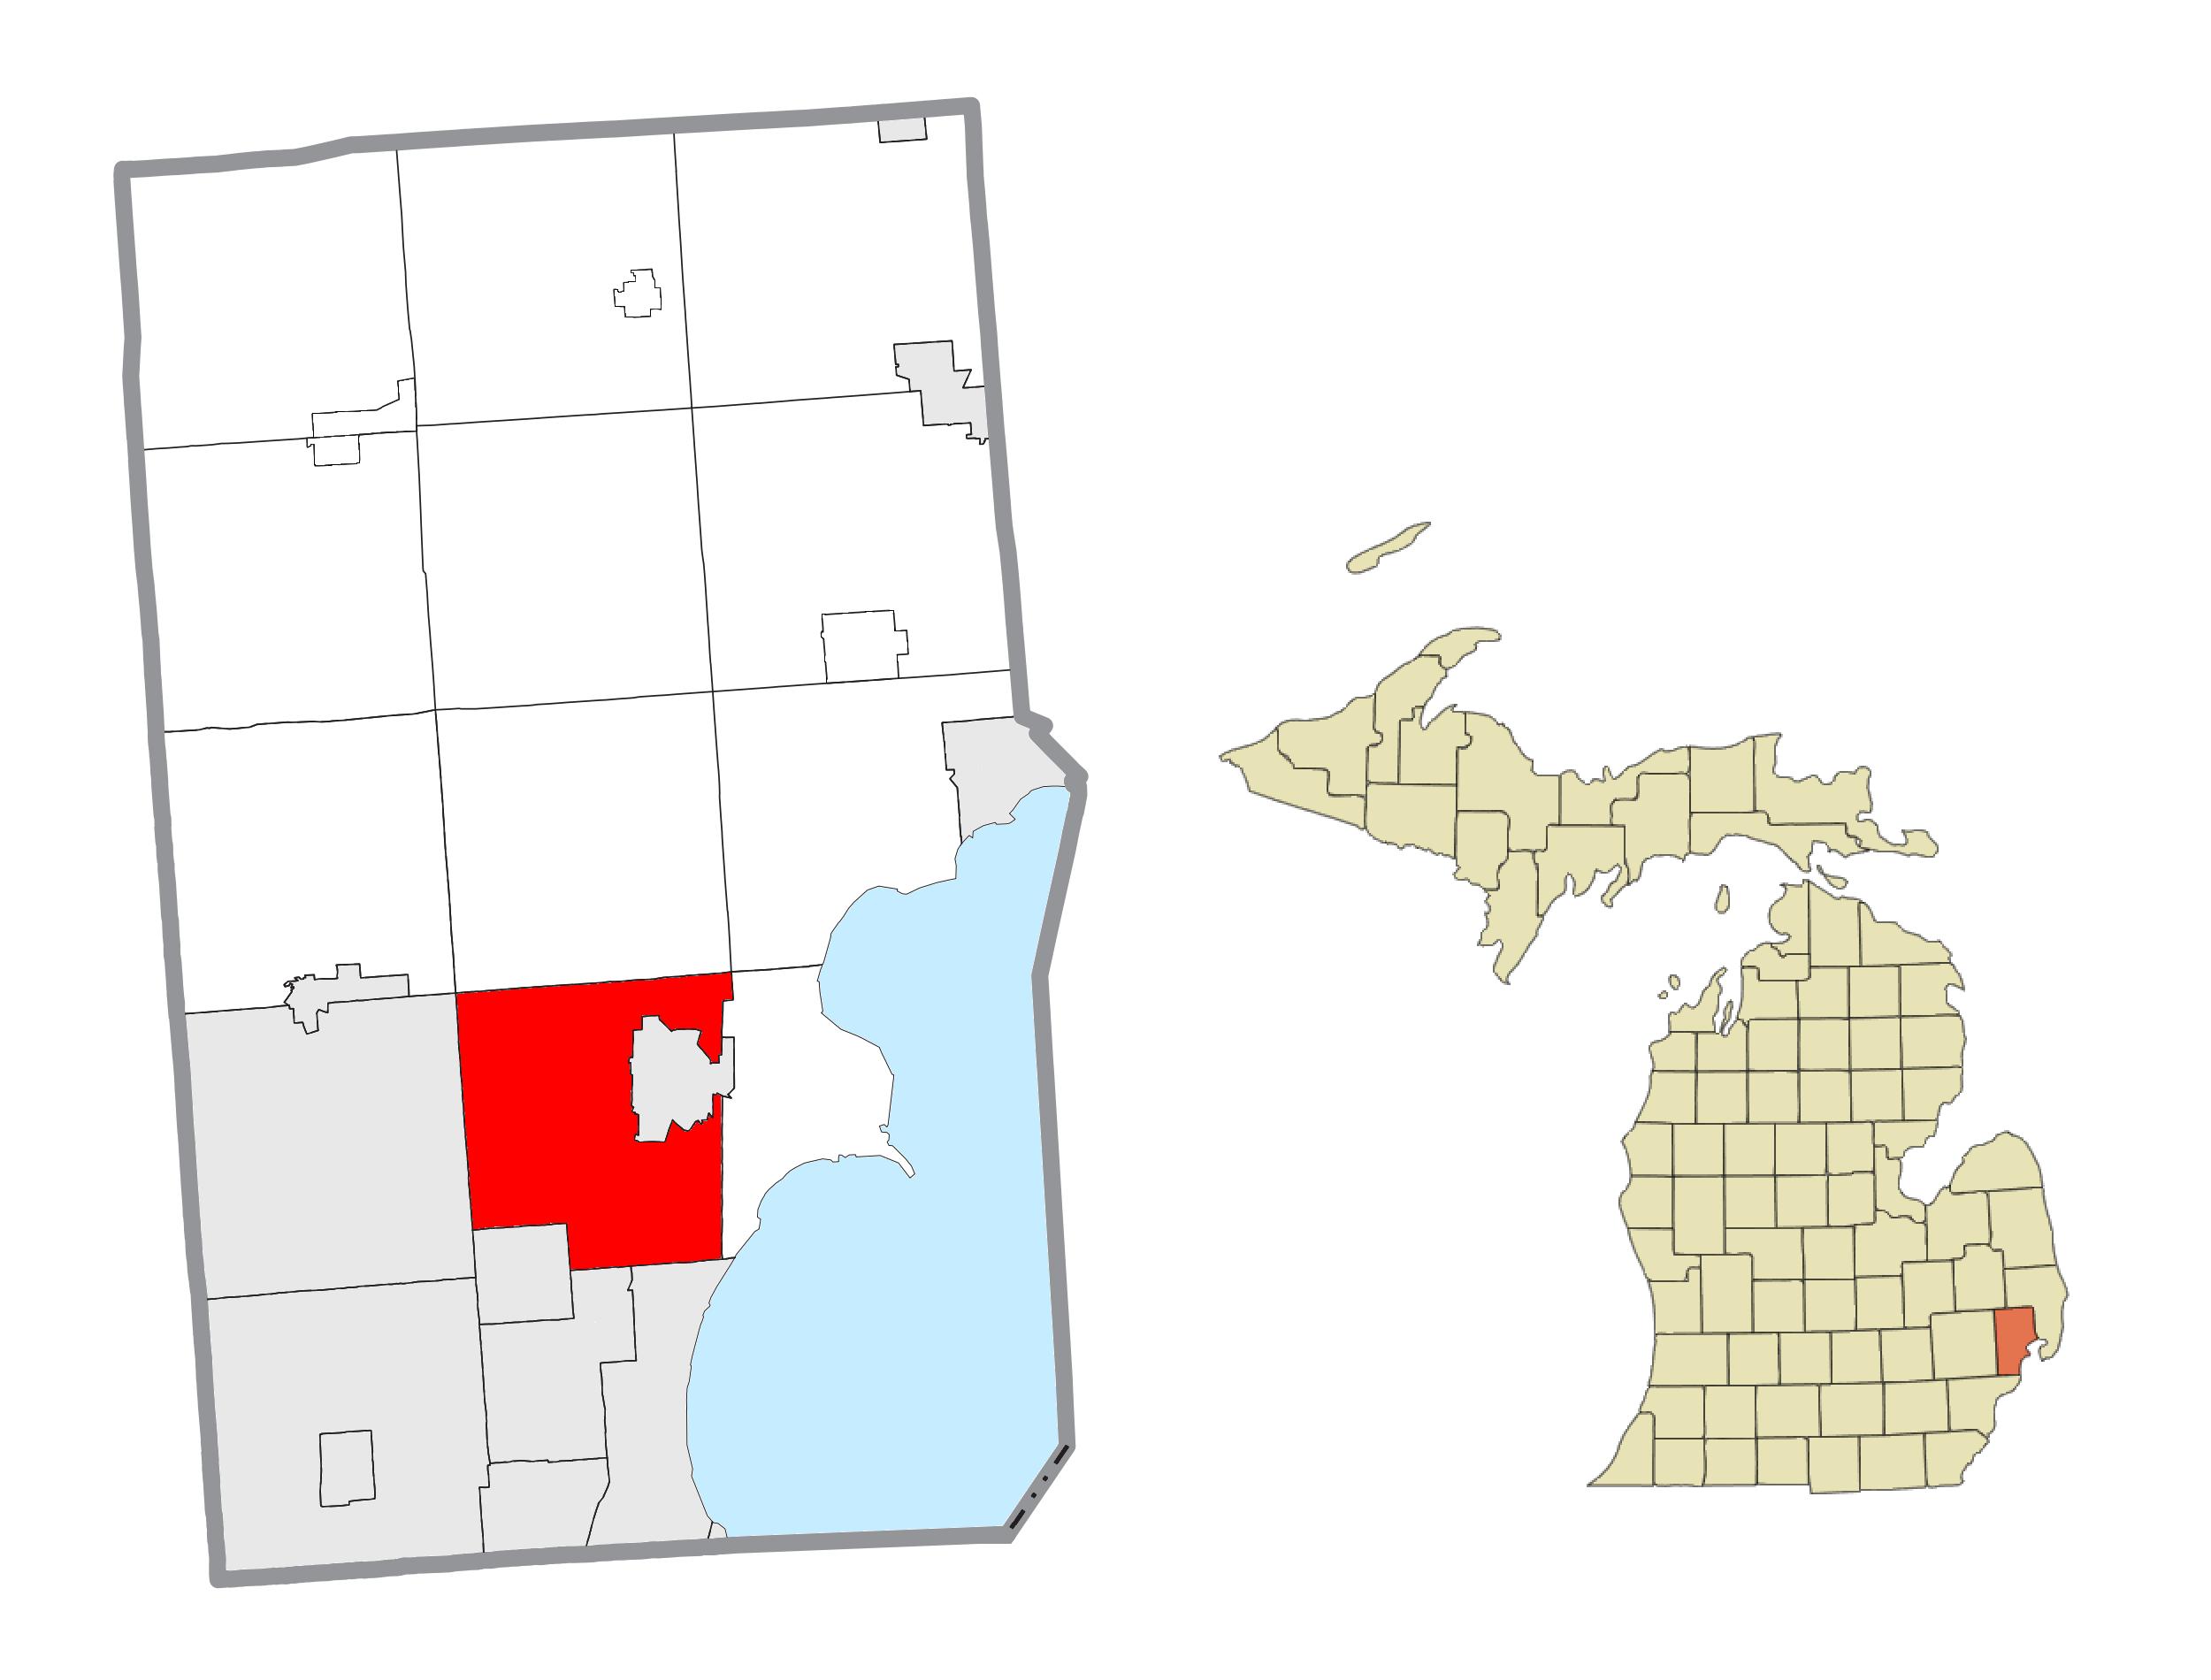 Clinton Township, Macomb County, Michigan - Wikipedia